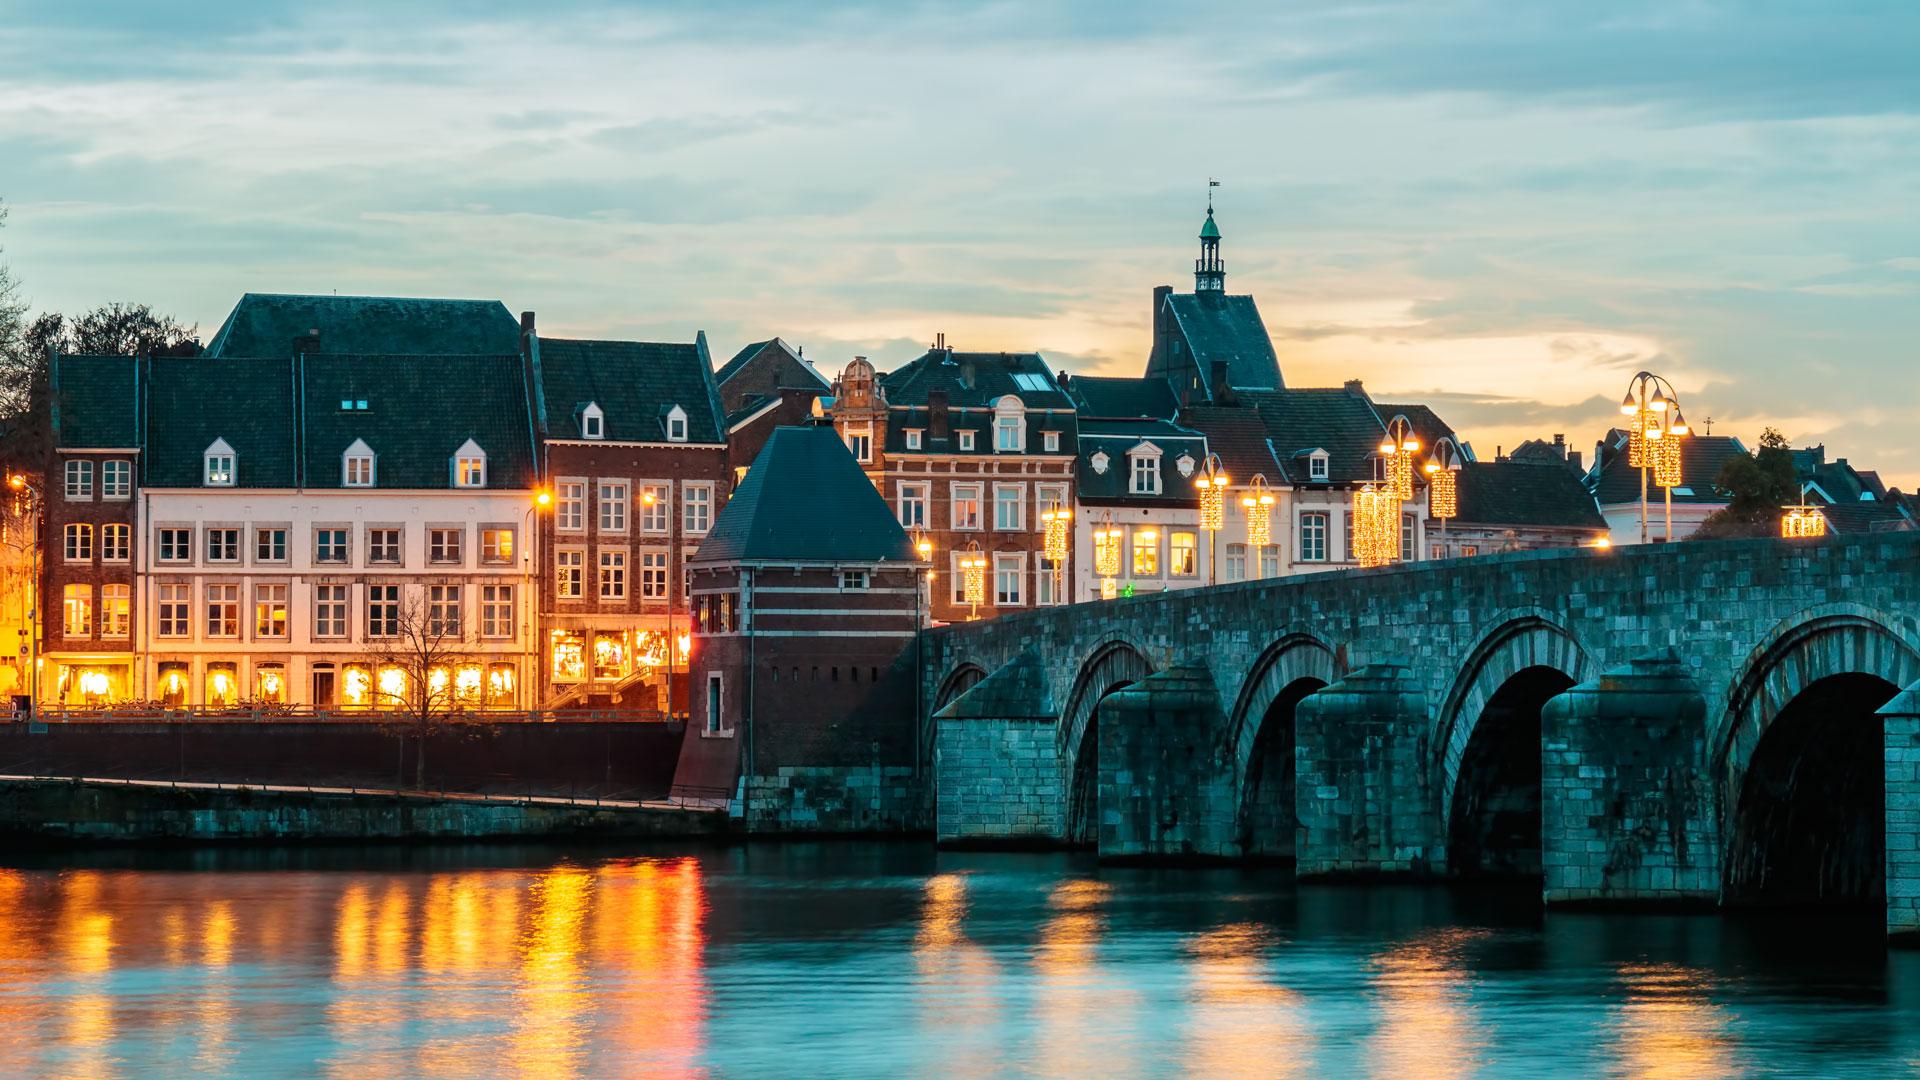 Routebeschrijving Maastricht